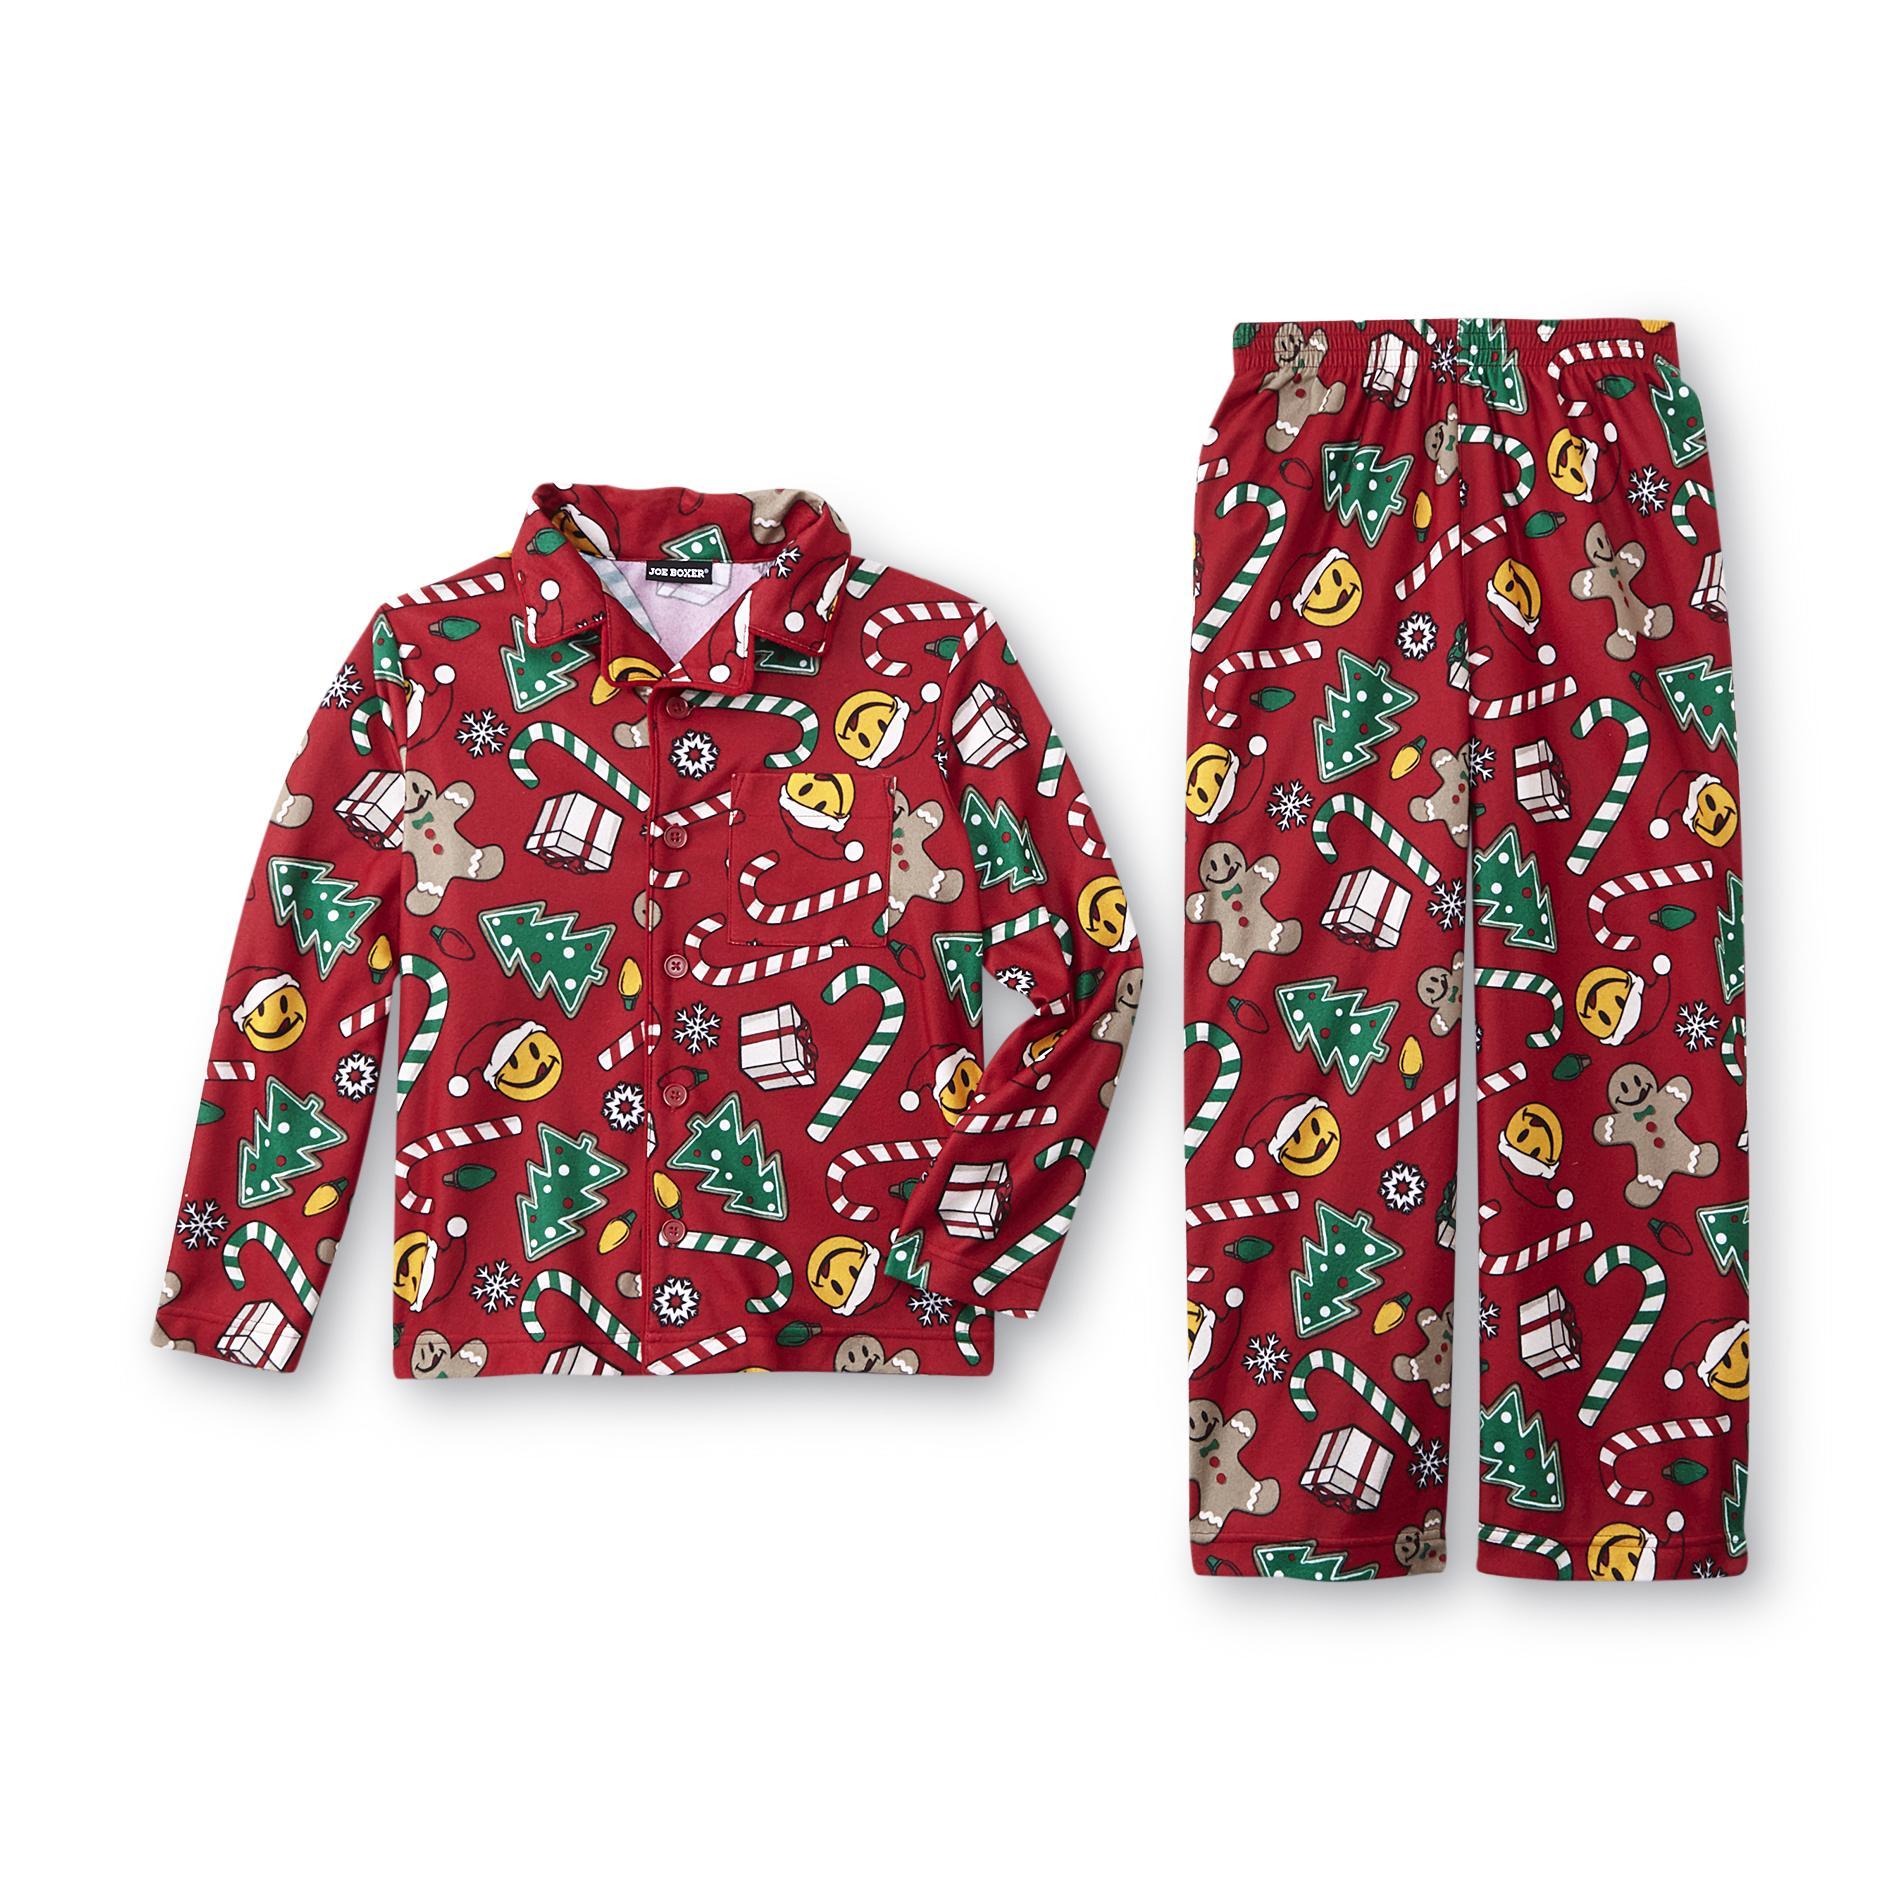 sears kitchen appliance bundles kohler pull out faucet repair joe boxer boy's christmas pajama shirt & pants - candy ...